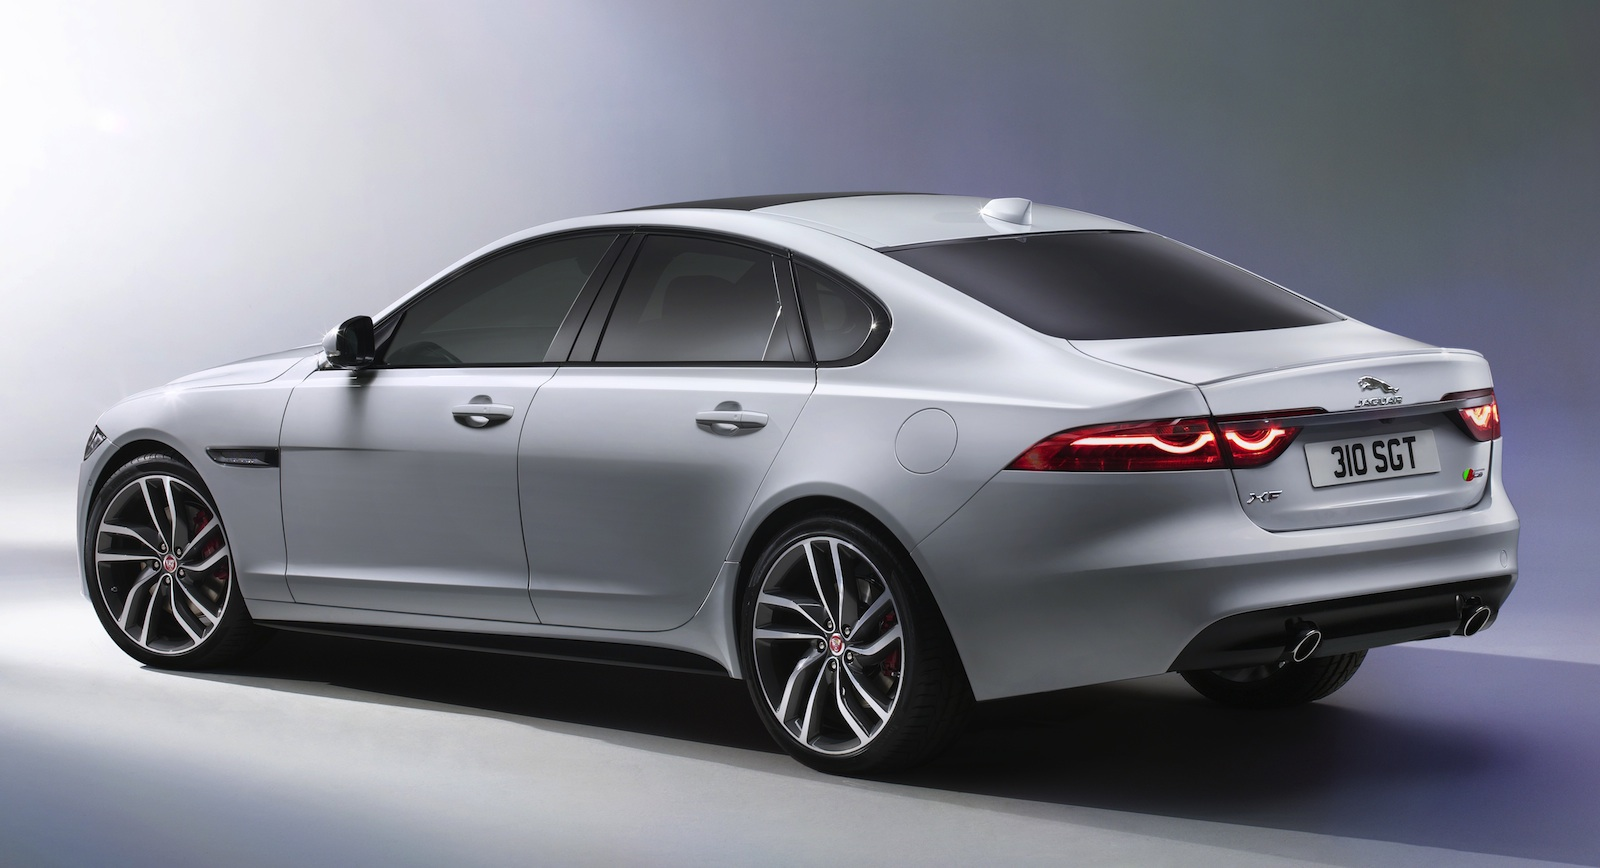 Jaguar xjl car price in india 2017 11